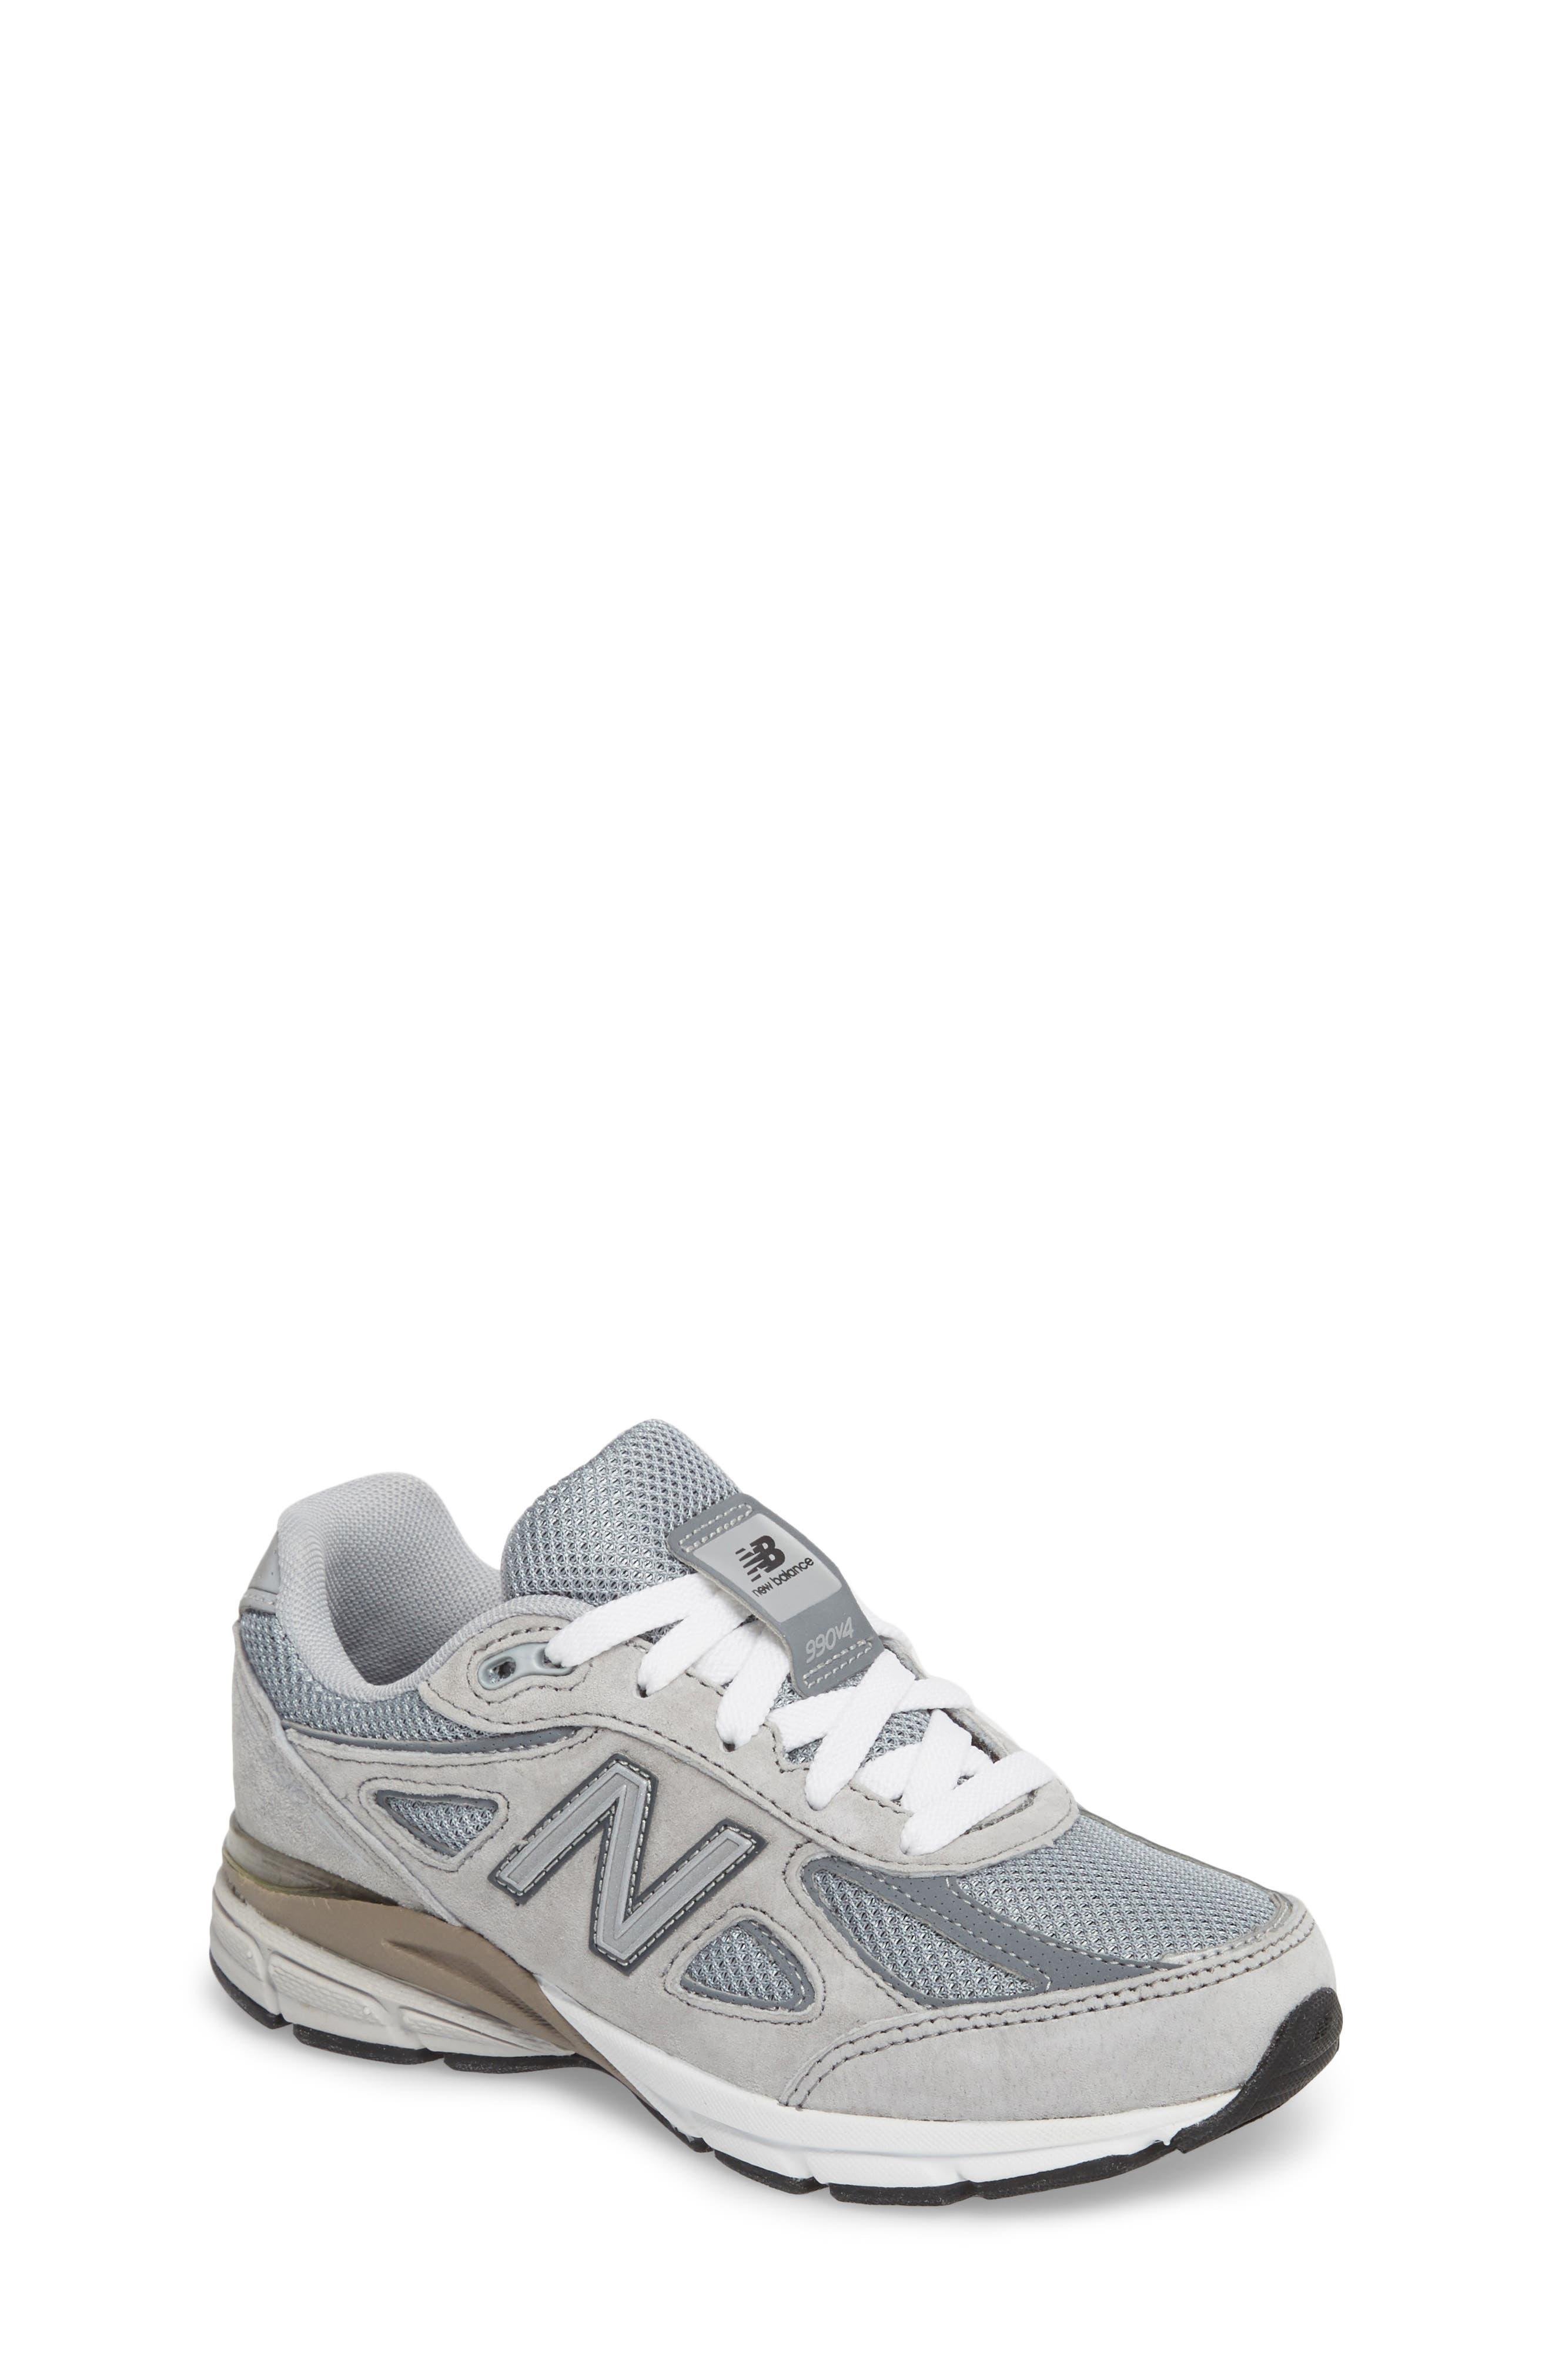 990 Sneaker,                             Main thumbnail 1, color,                             030